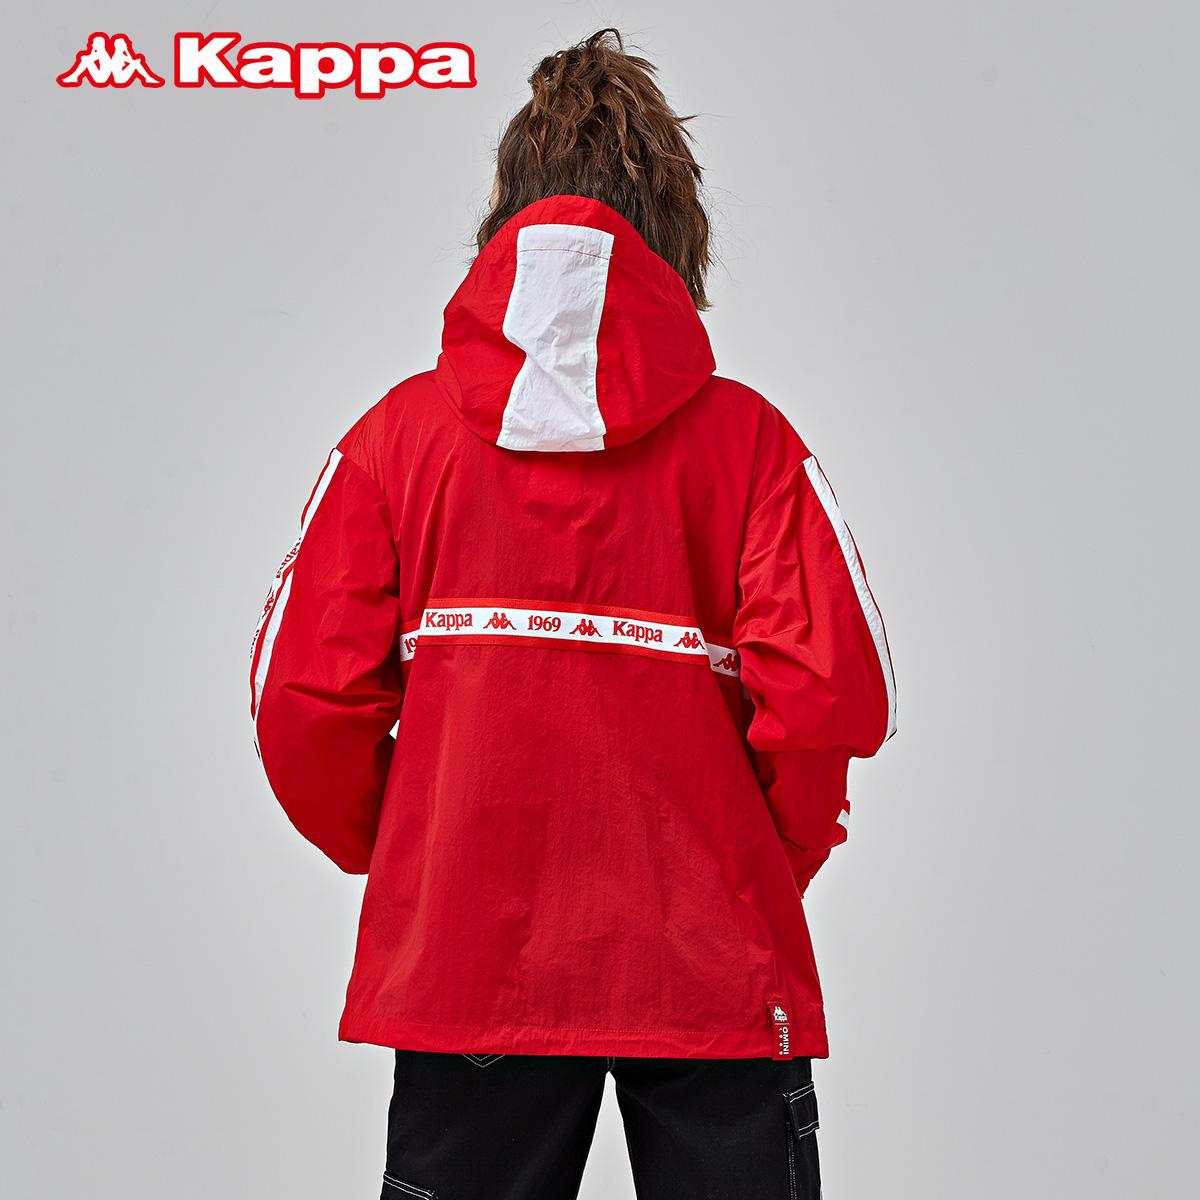 K09W2FJ05D 新款 2019 情侣男女防风衣休闲外套连帽开衫 卡帕 KAPPA